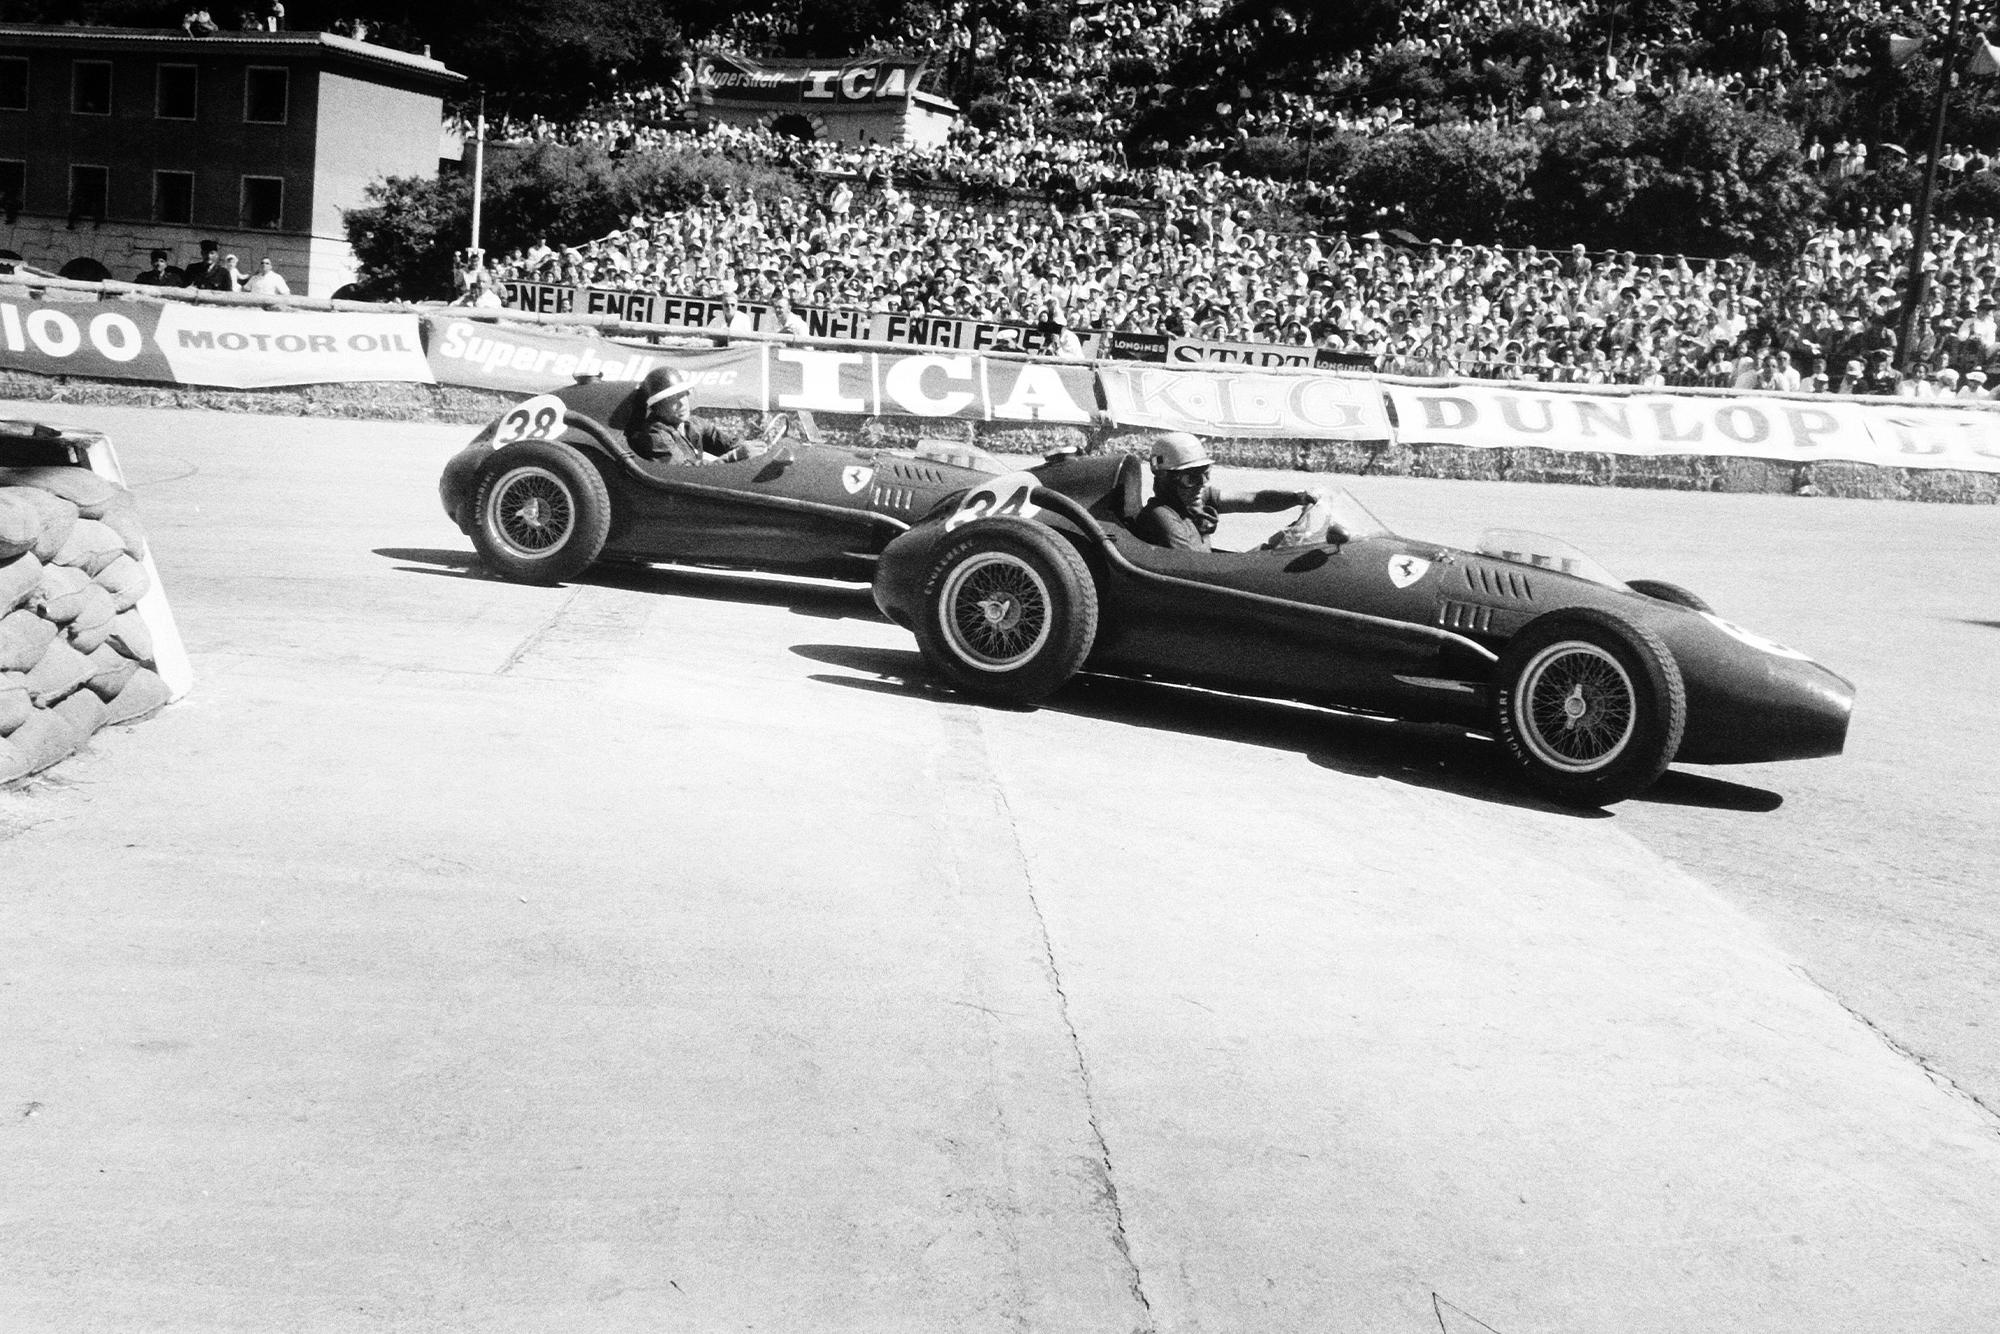 Ferrari drivers Hawthorn and Musso at the 1958 Monaco Grand Prix